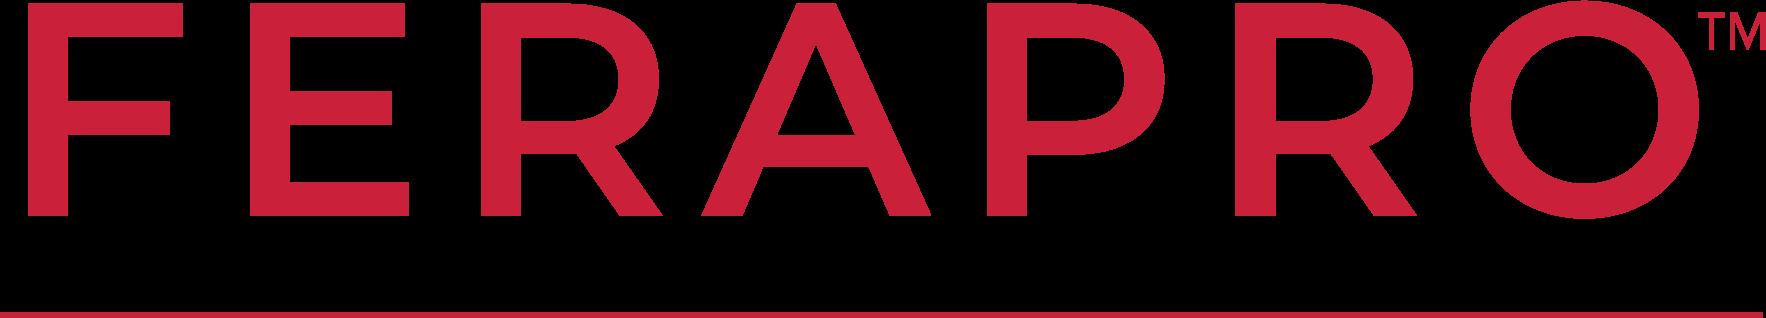 FERAPRO™ | Bob's Iron Formula